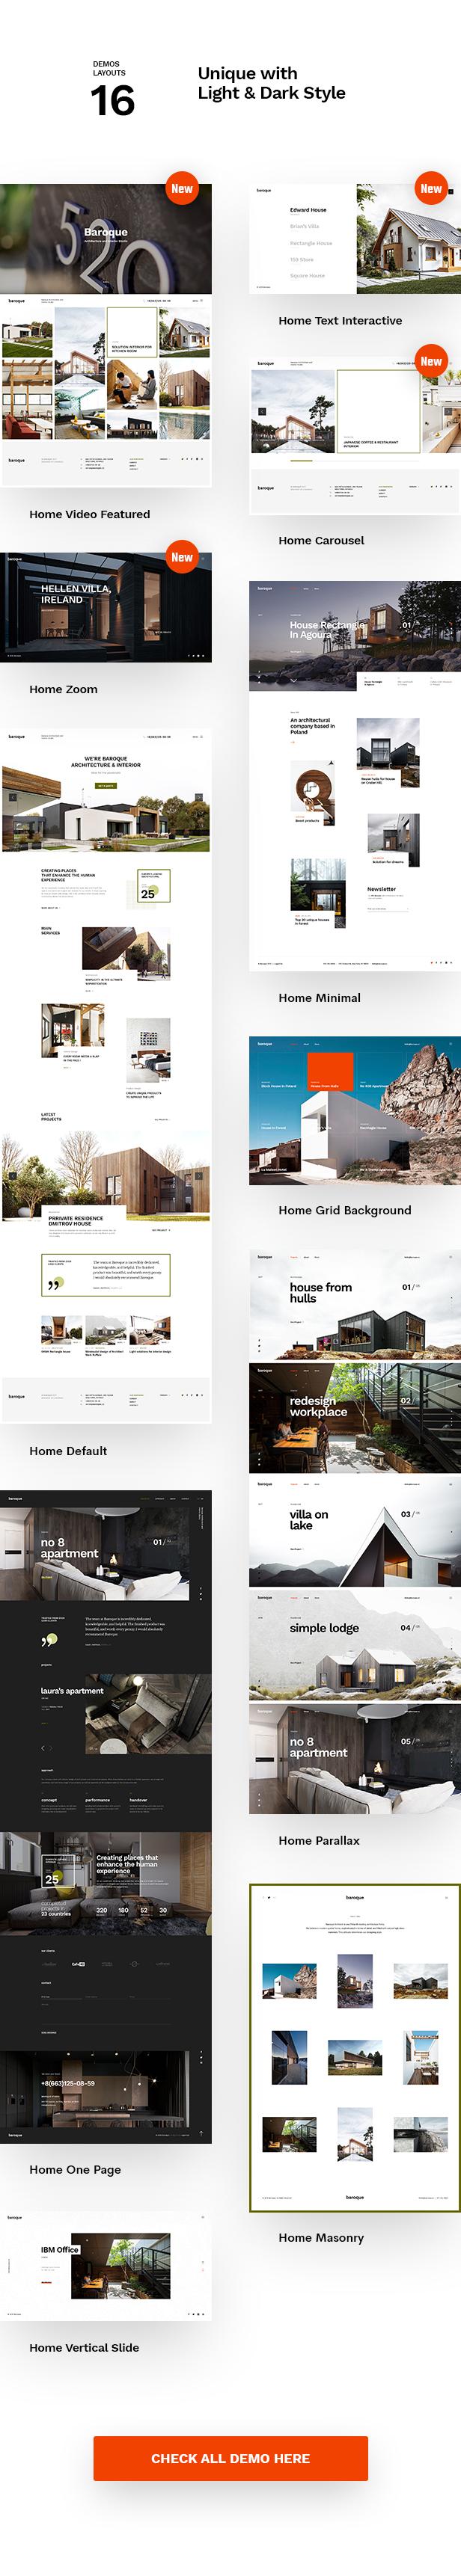 Baroque - Architecture & Interior WordPress Theme - 6